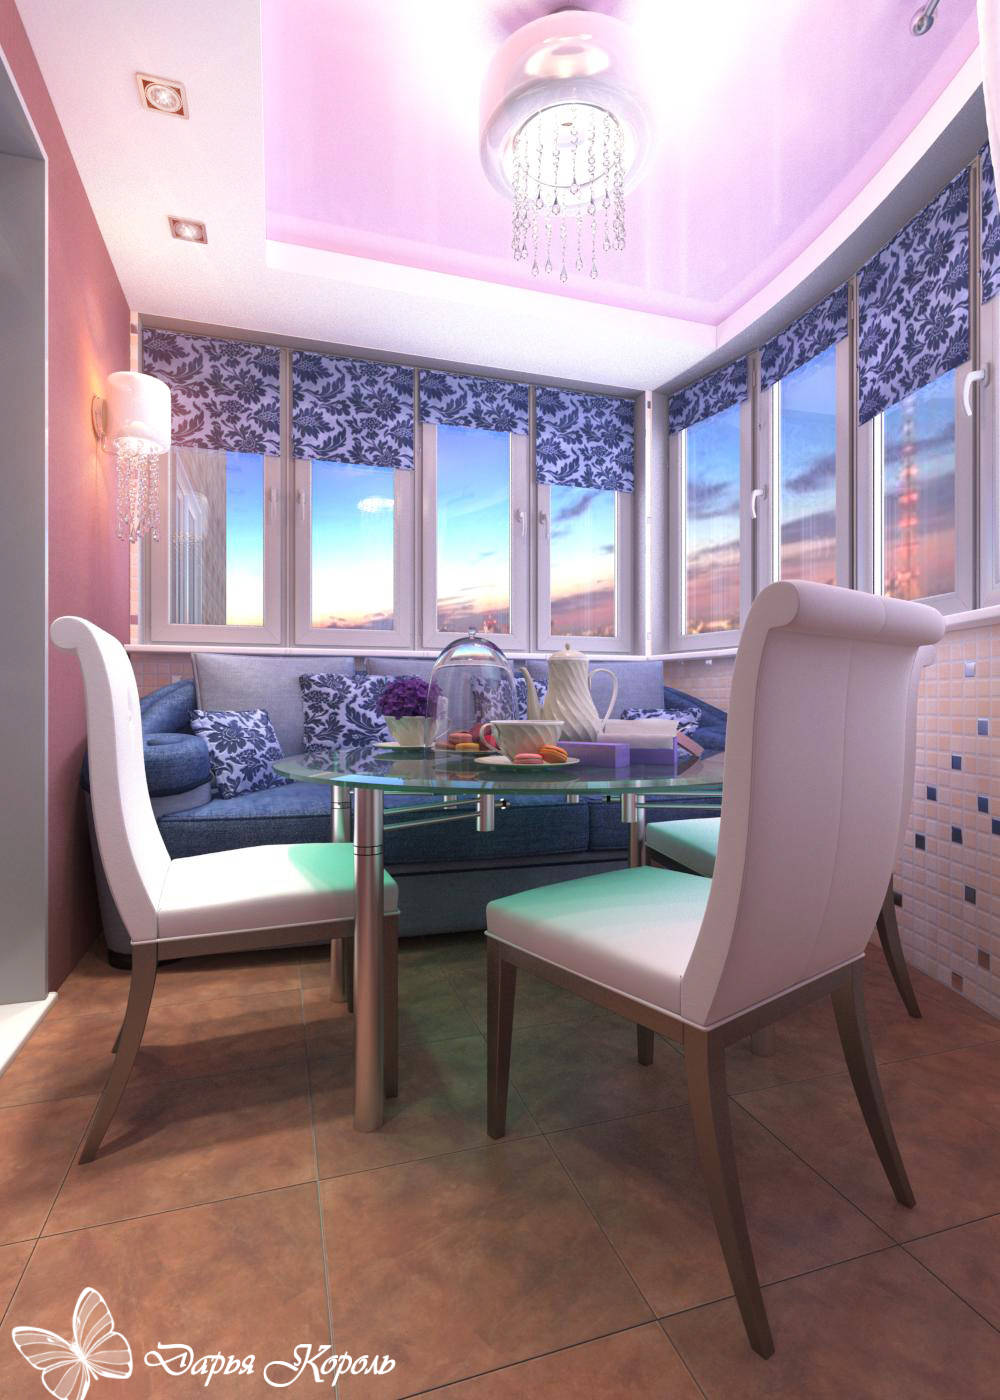 Лоджия-столовая фуксия - интерьеры квартир, домов - myhome.r.